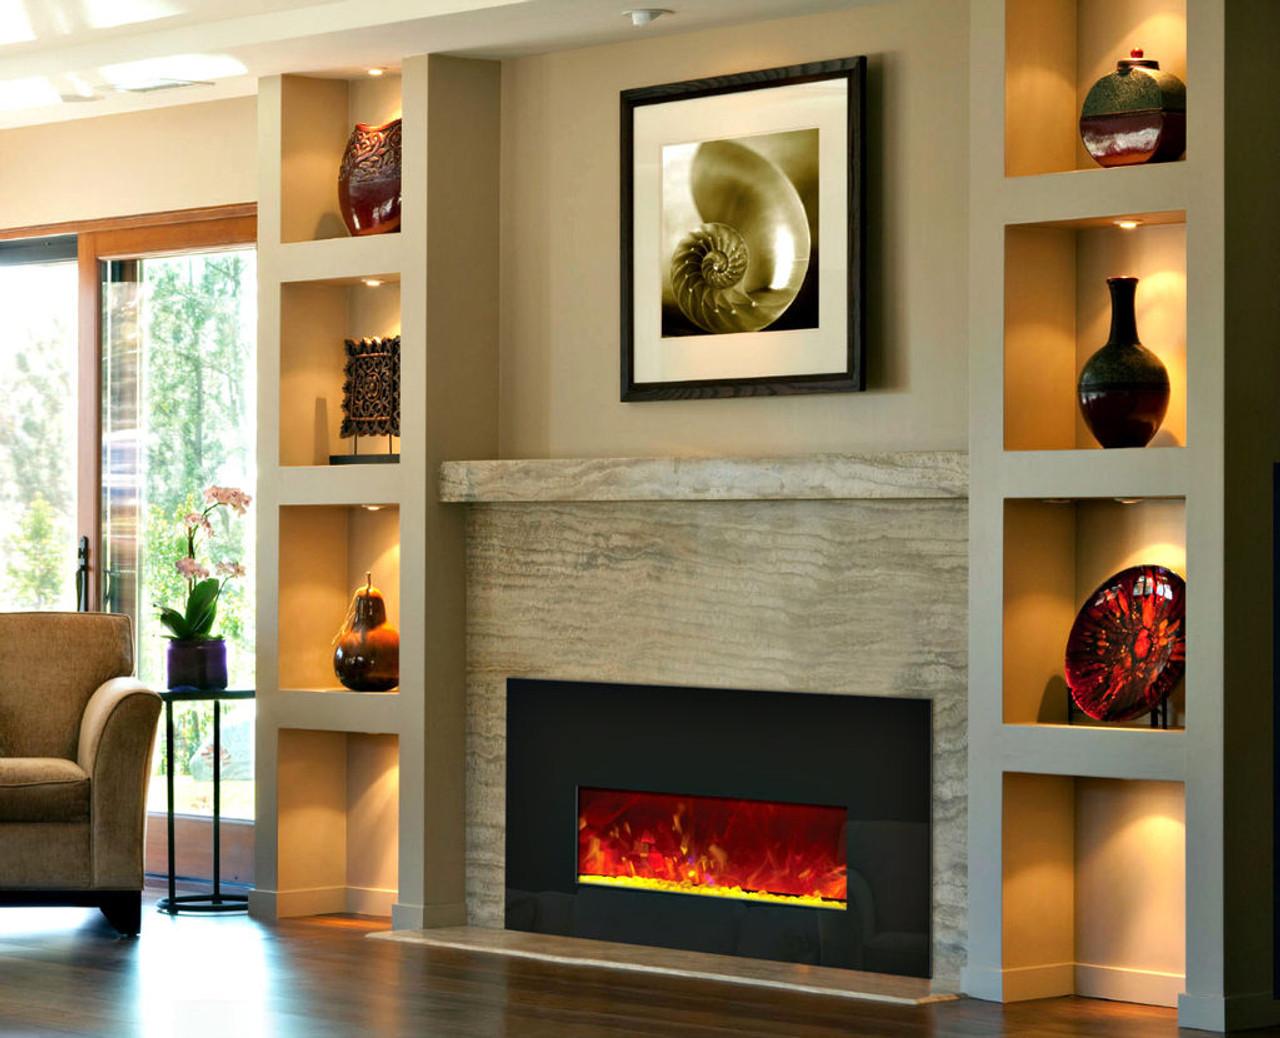 Amantii Insert 26 3825 Electric Fireplace Insert